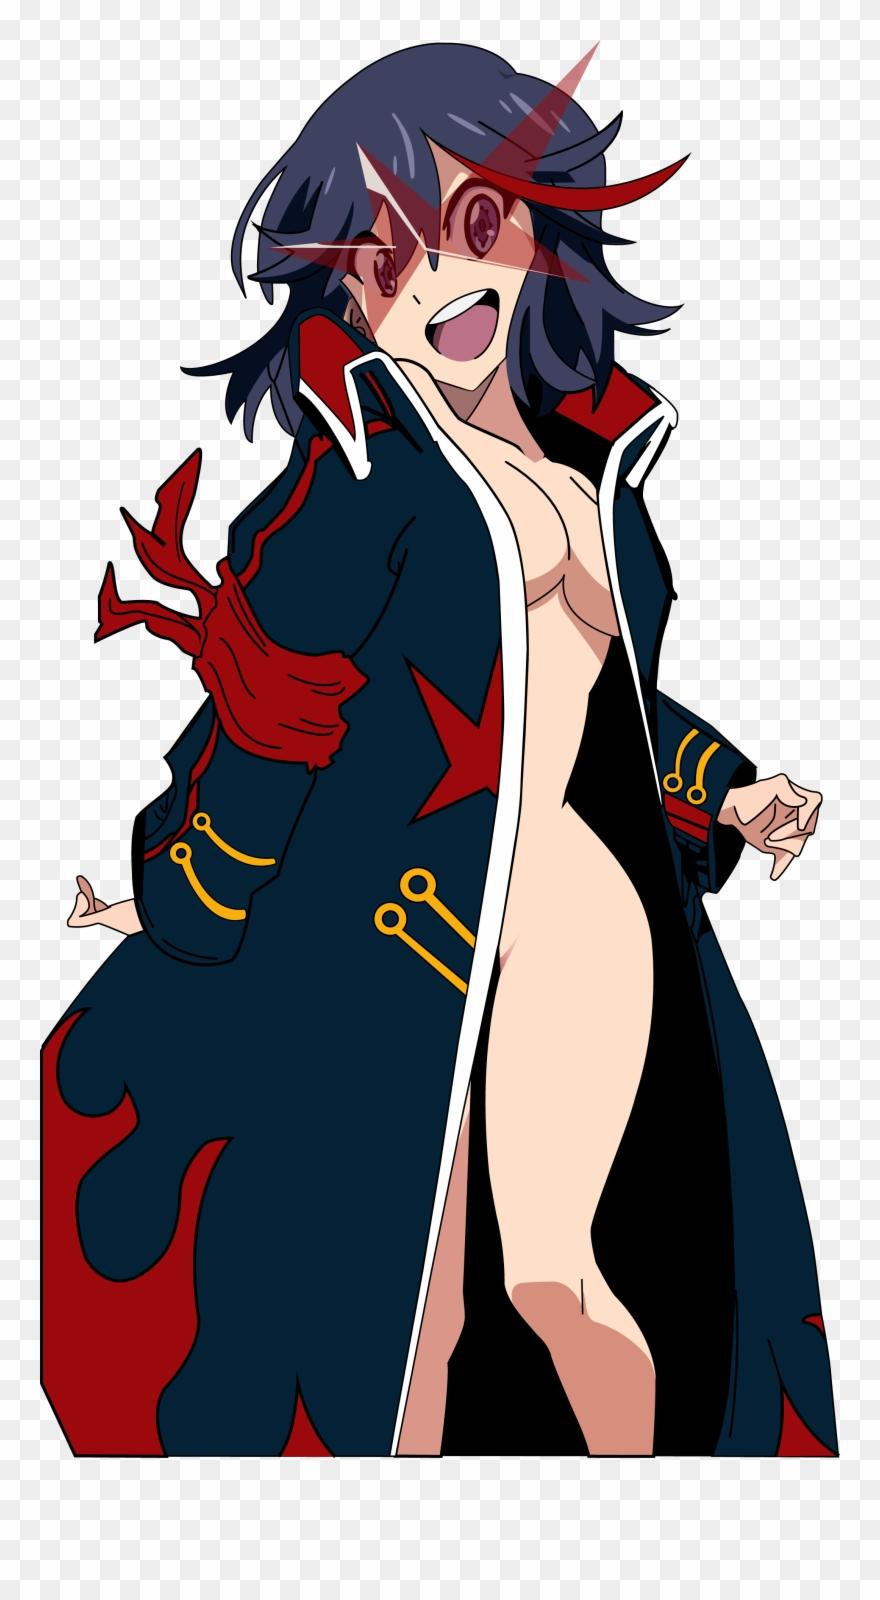 Matoi ryuko clipart clip stock Ryuko Matoi Red Fictional Character Human Hair Color ... clip stock